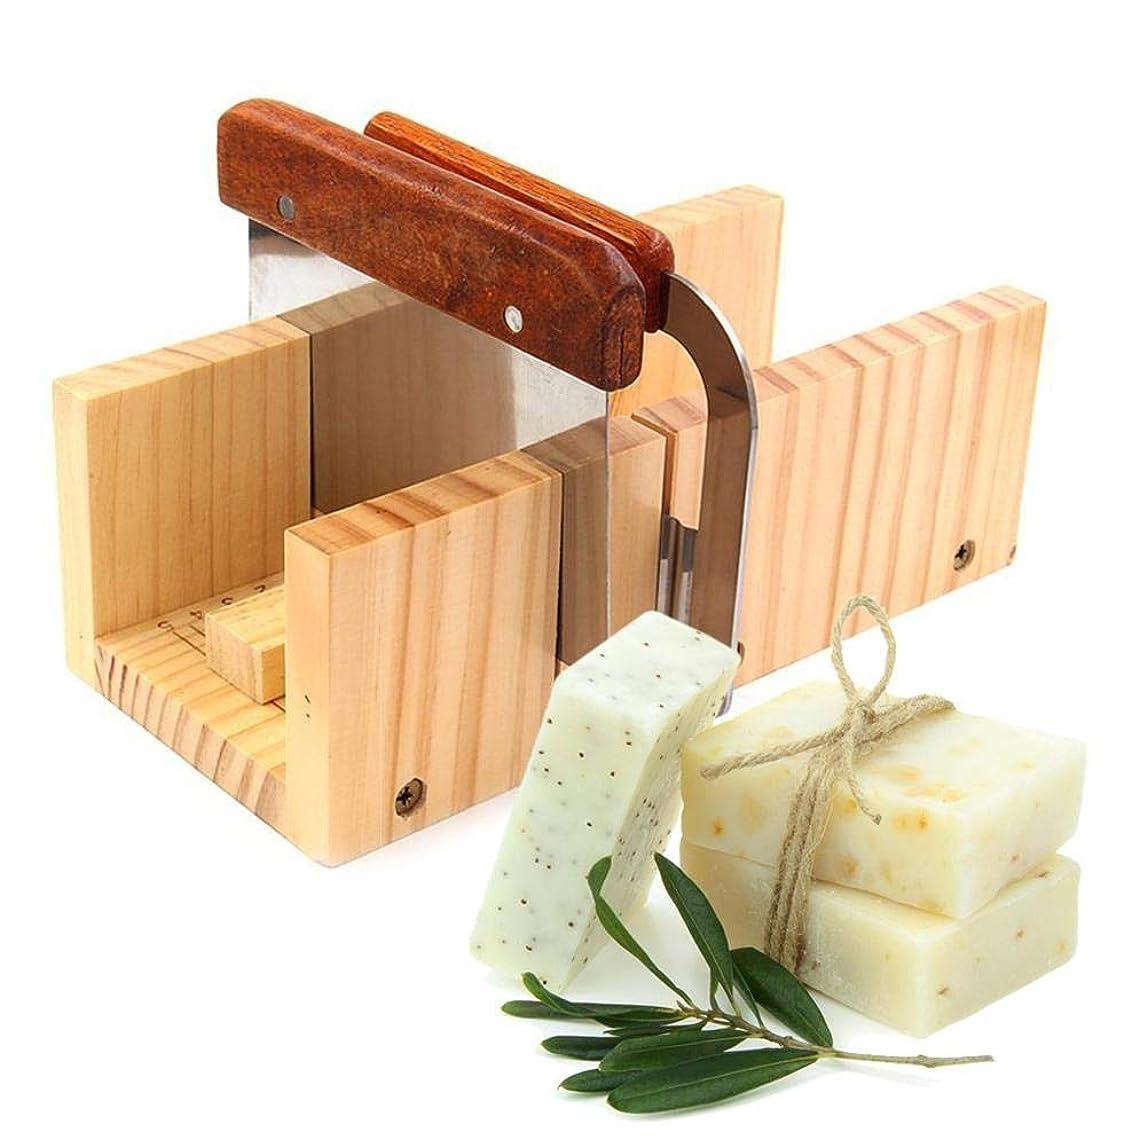 Ragem ソープカッター 手作り石鹸金型 木製 ローフカッターボックス 調整可能 多機能ソープ切削工具 ストレートプレーニングツール